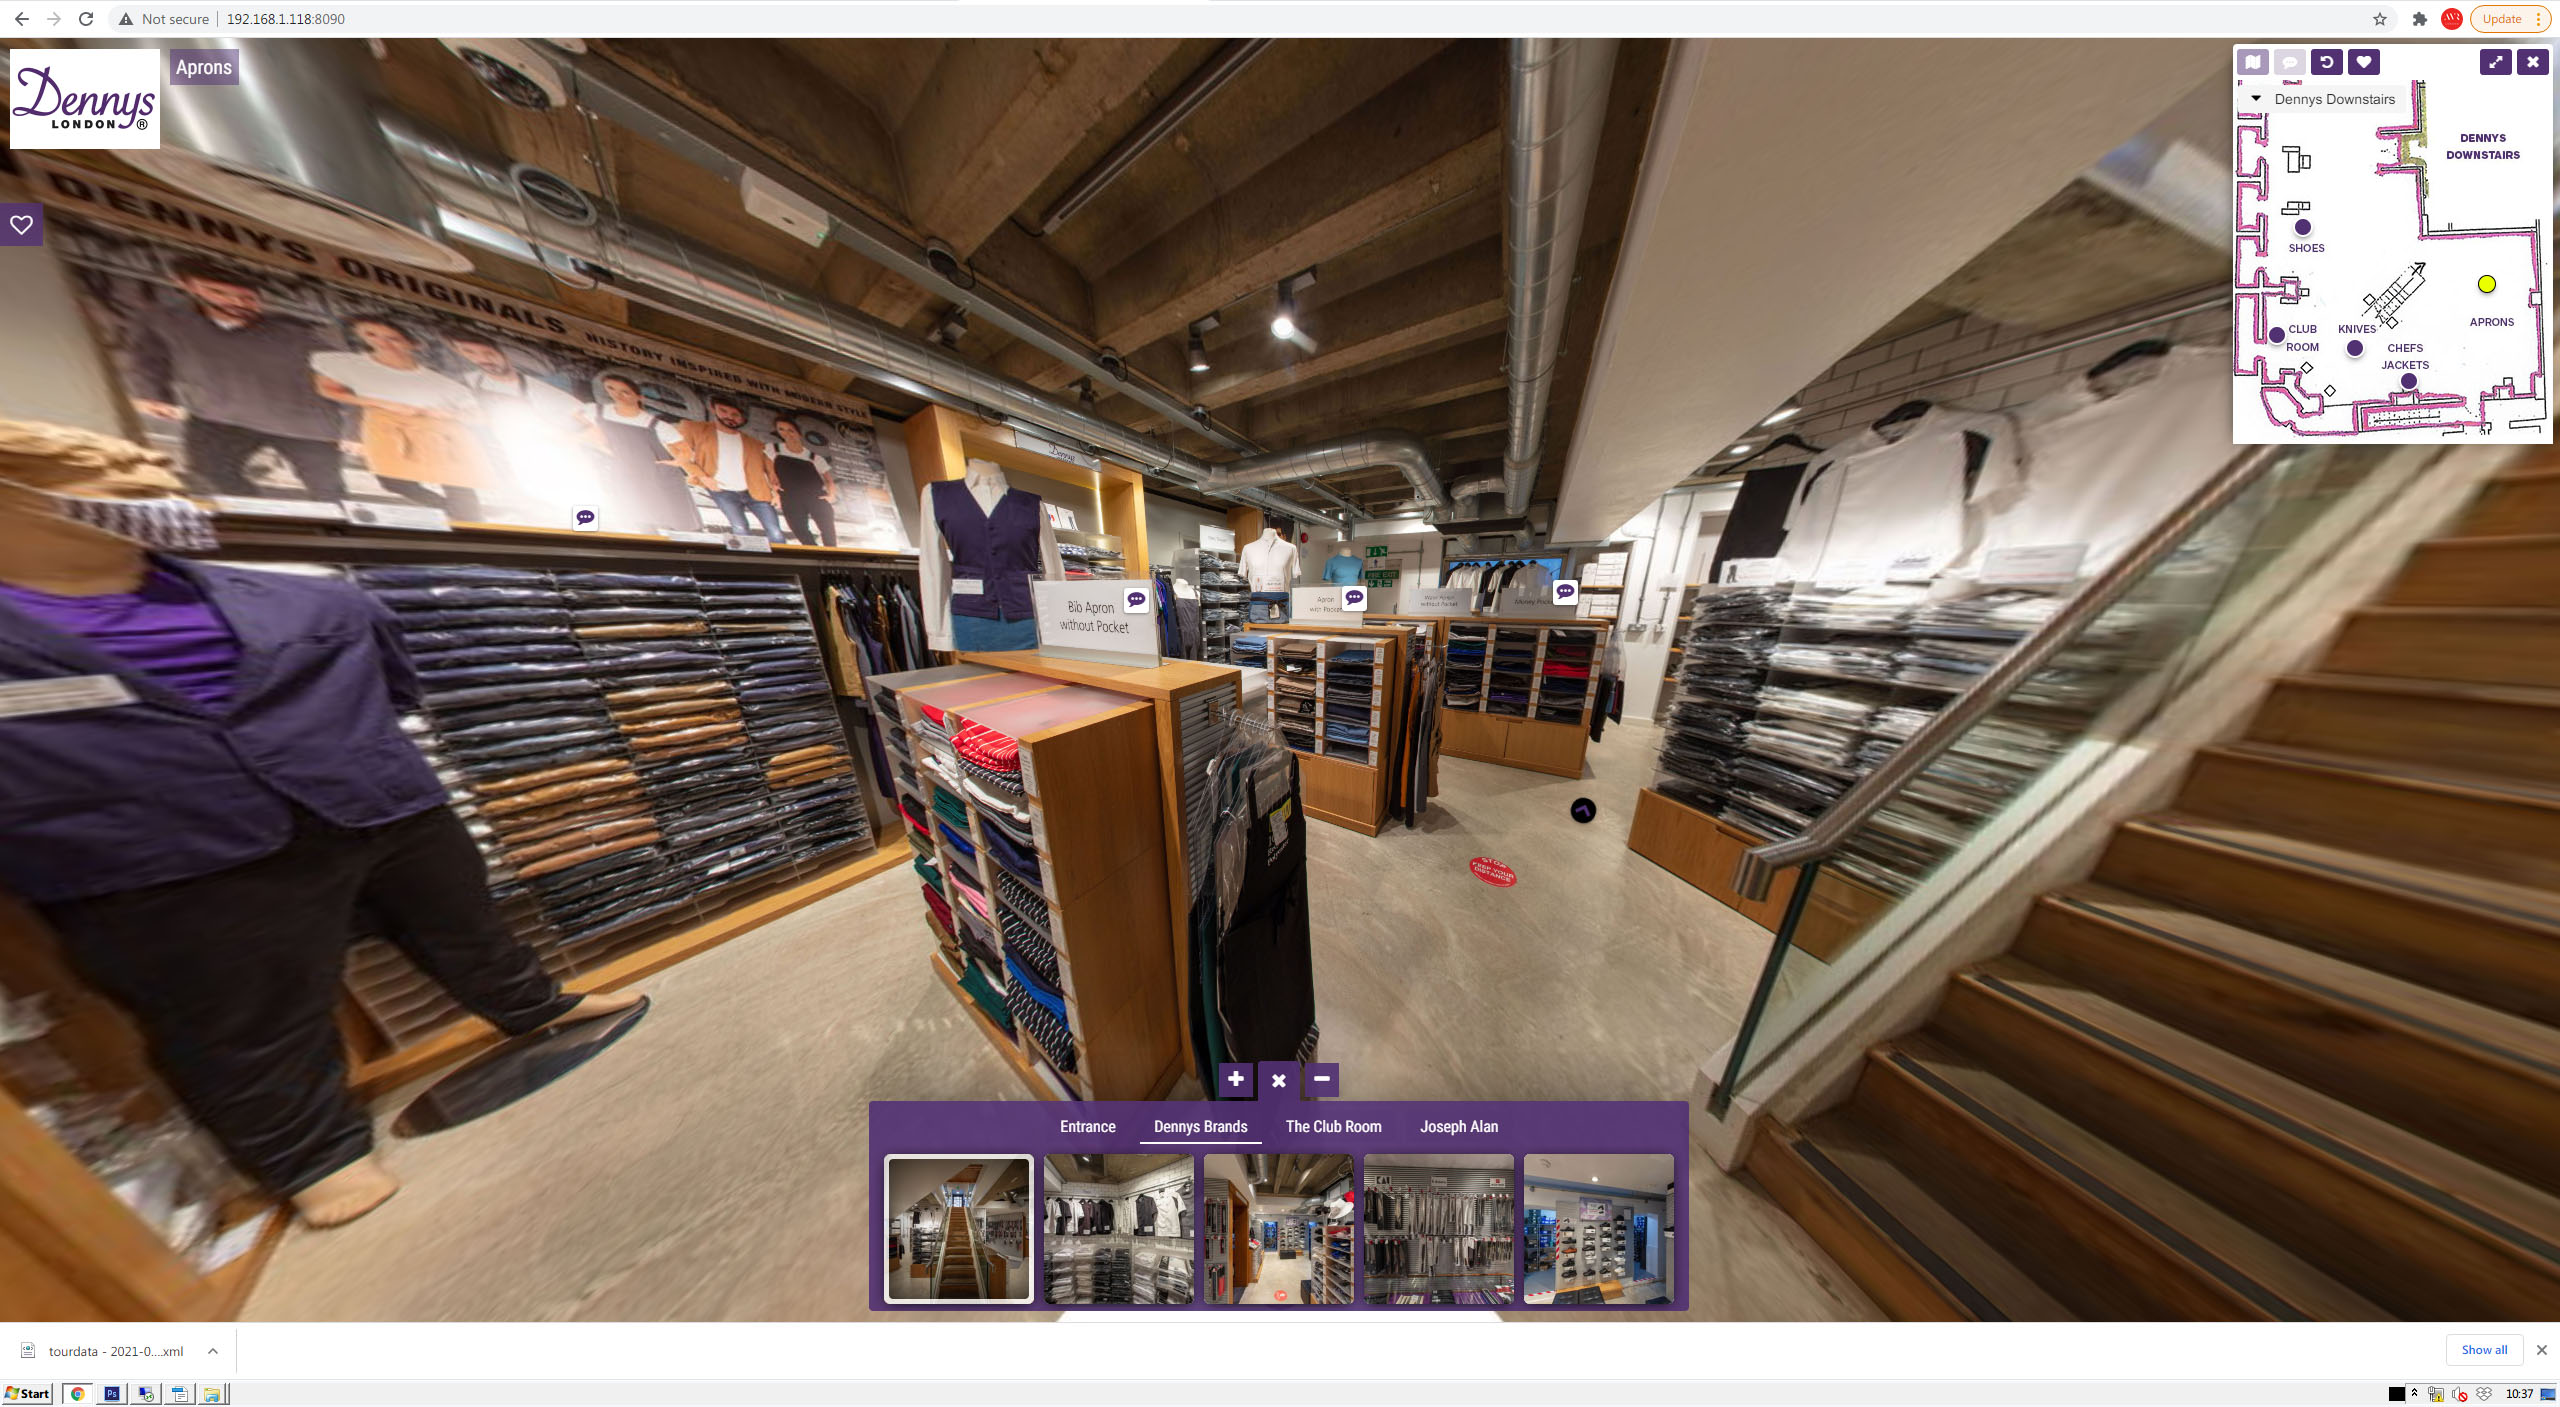 Dennys Brands Virtual Aprons